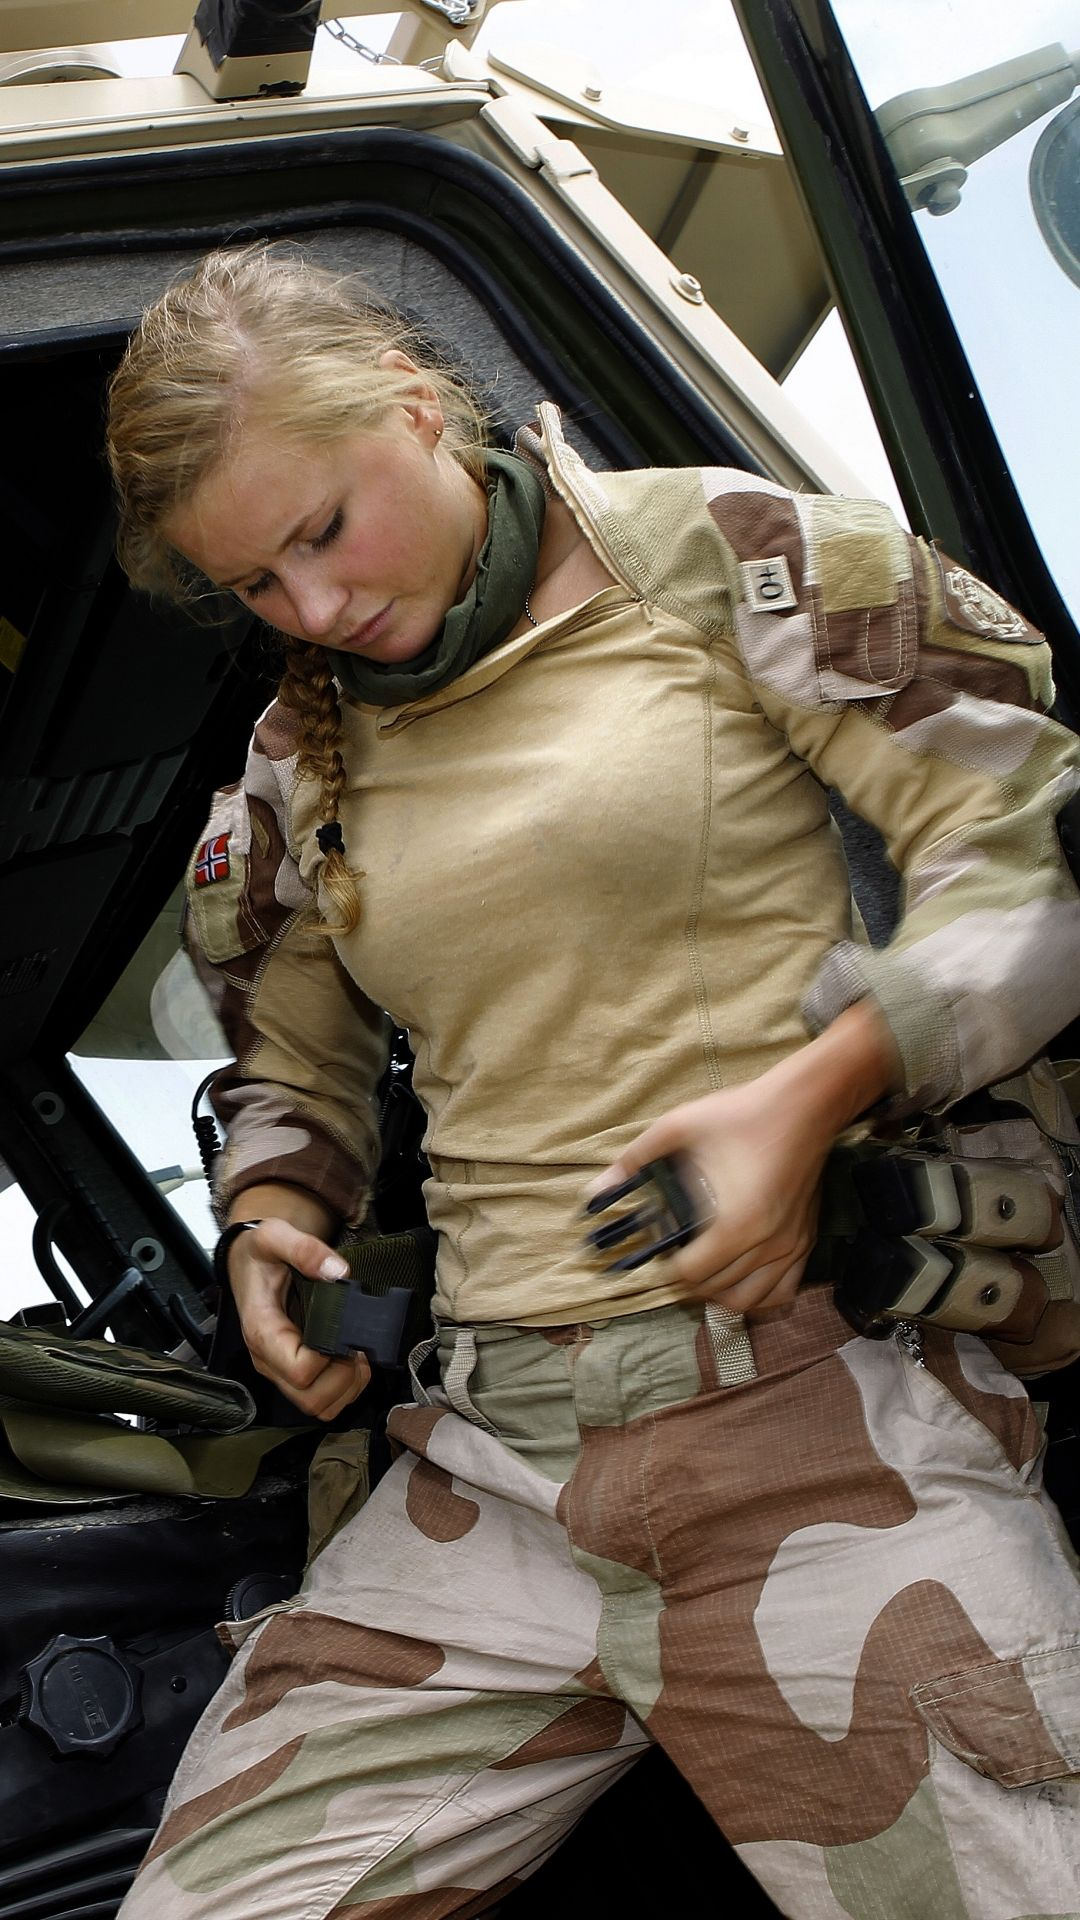 Military Phone Wallpapers - Top Free Military Phone ...